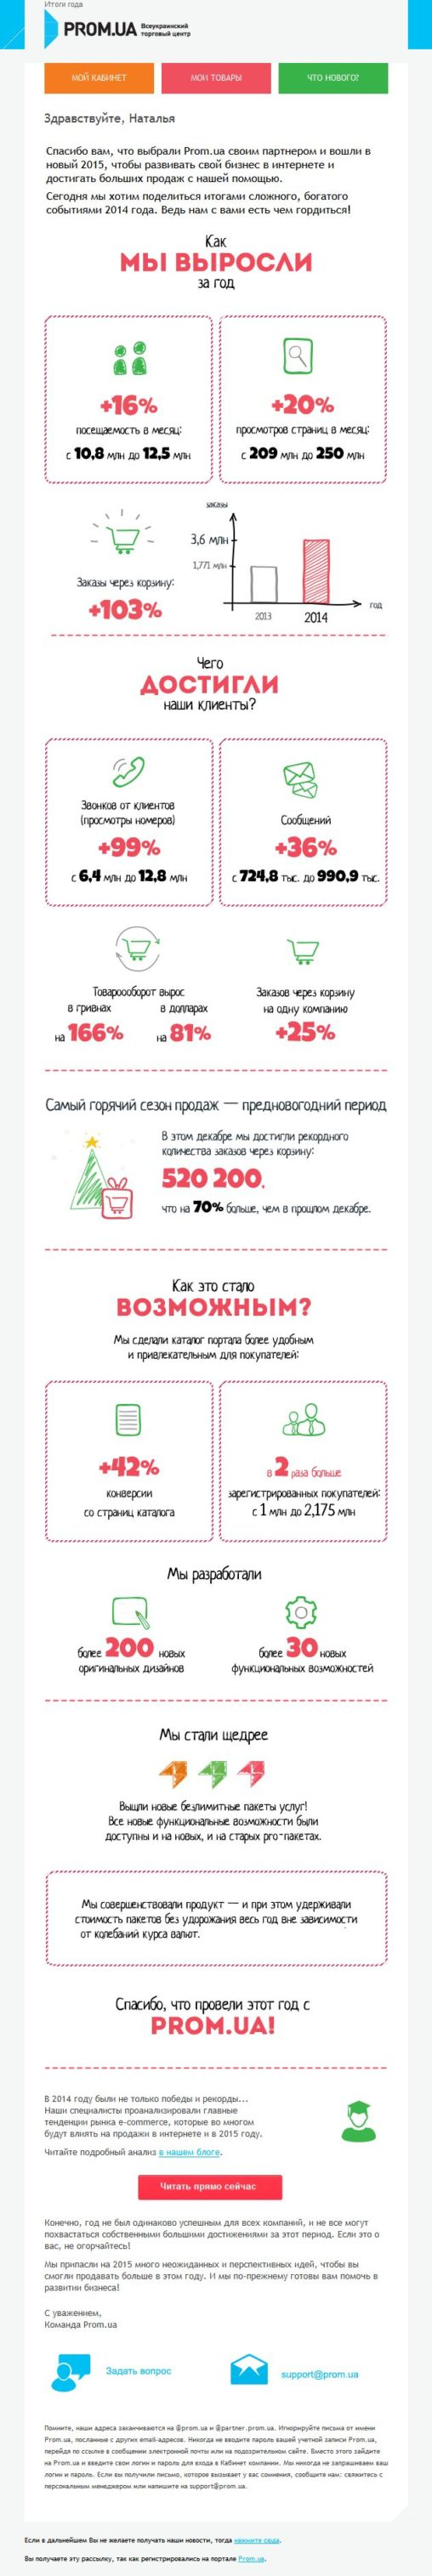 Prom.ua: Наталья, спасибо!